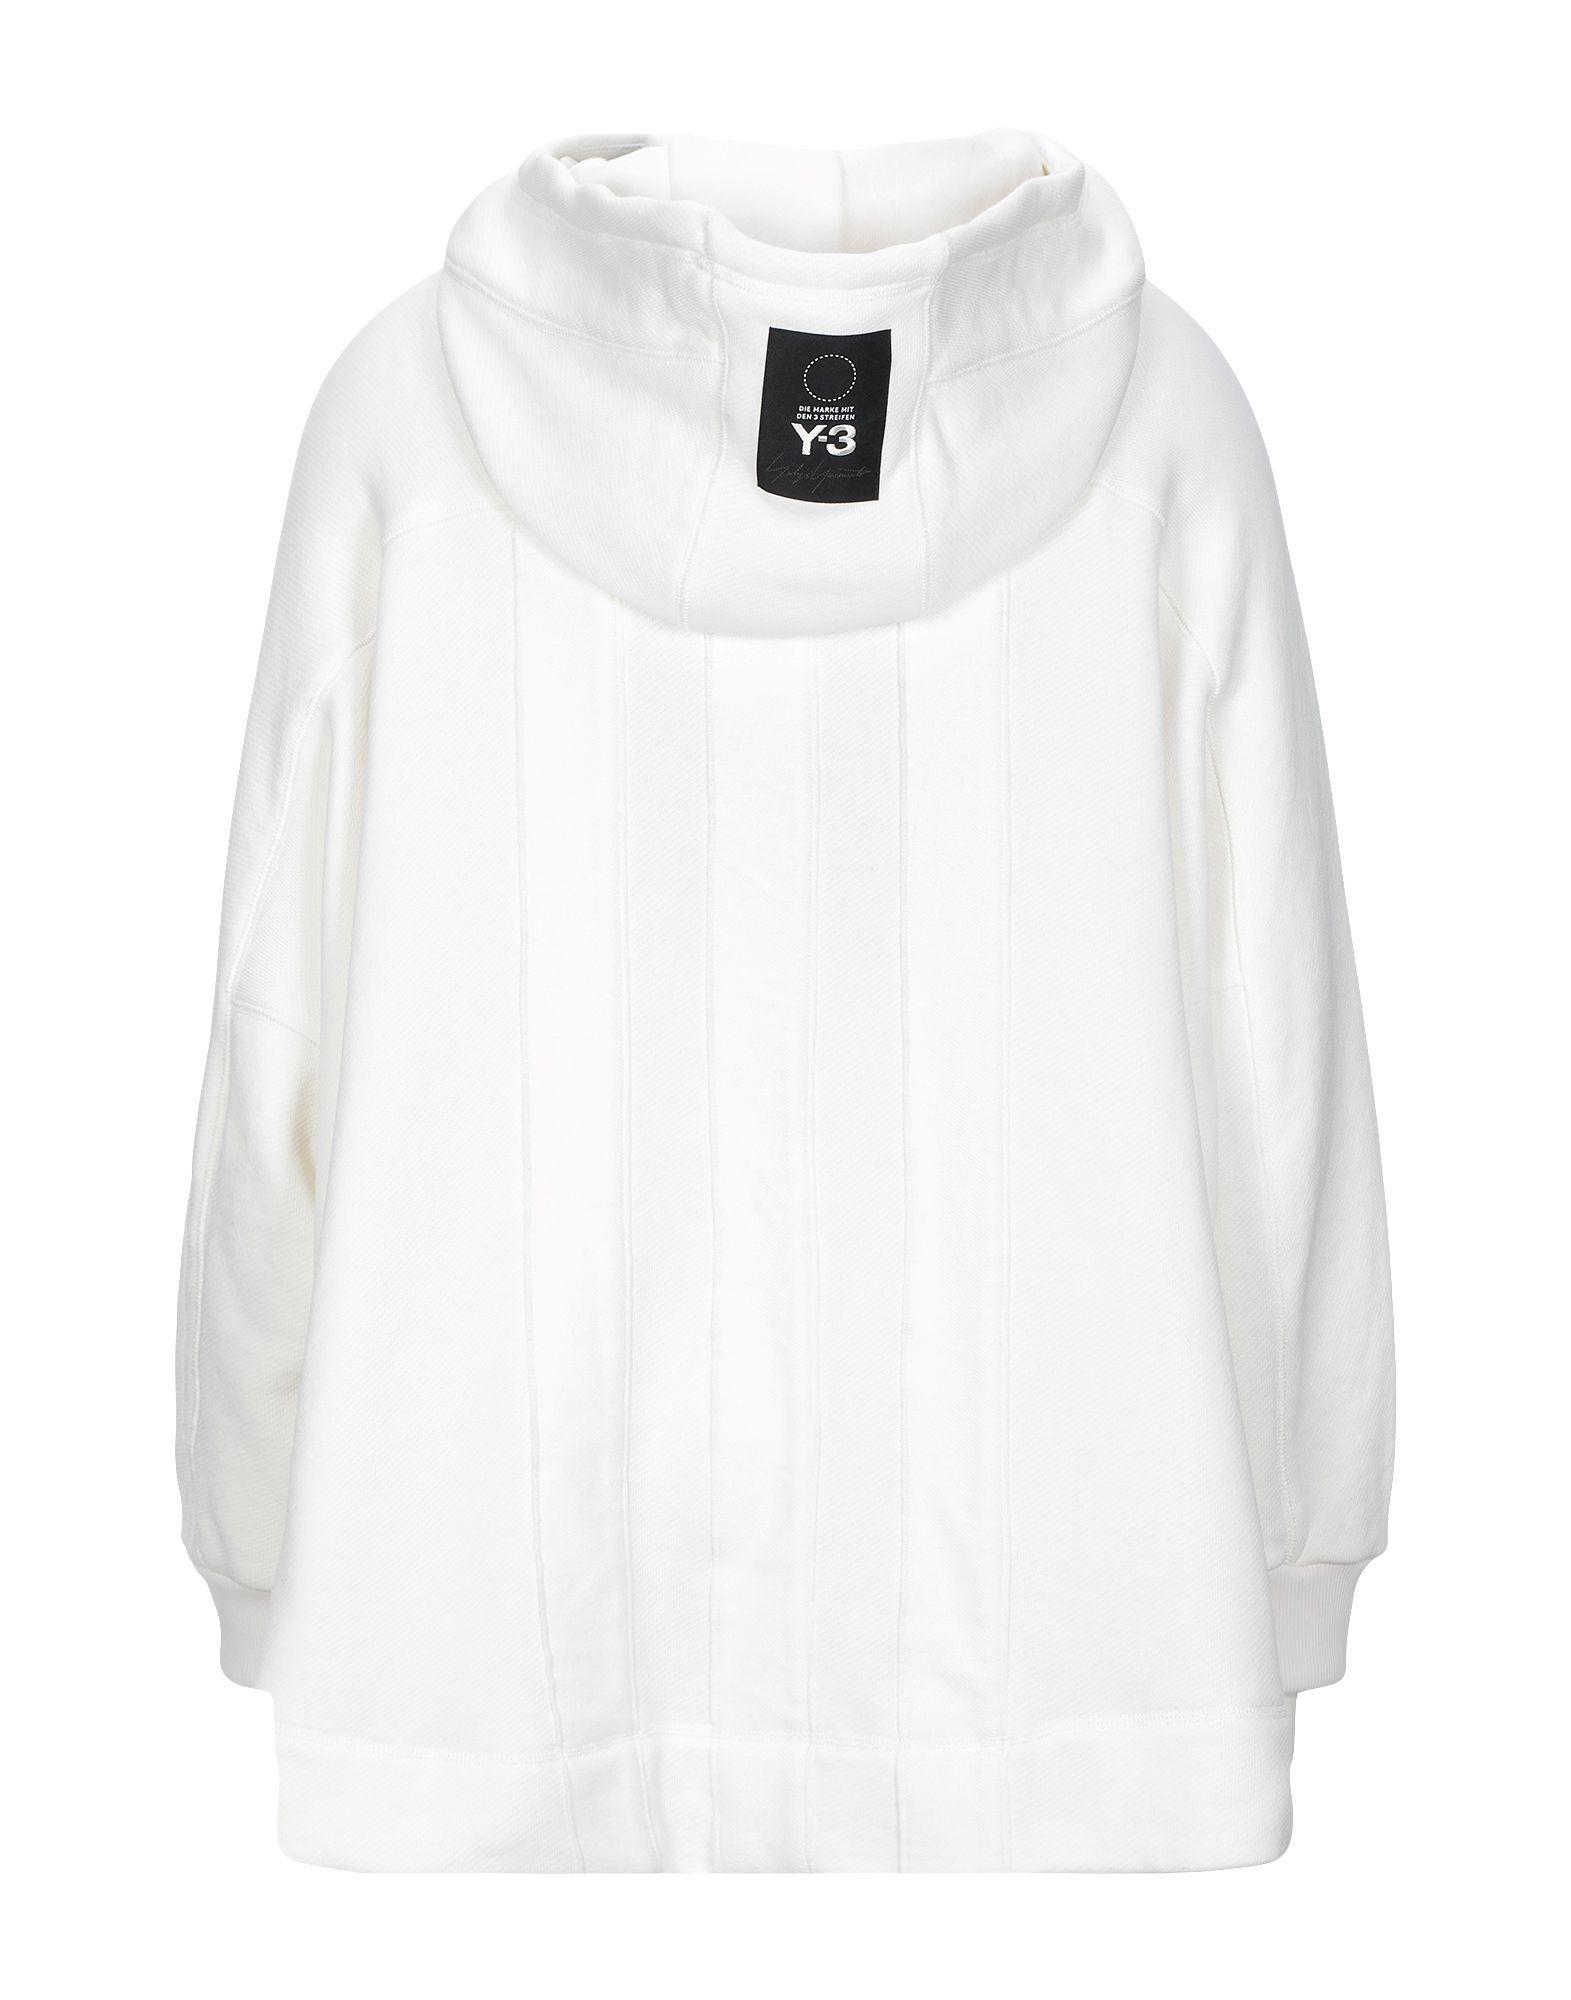 Y-3 White Cotton Hoodie